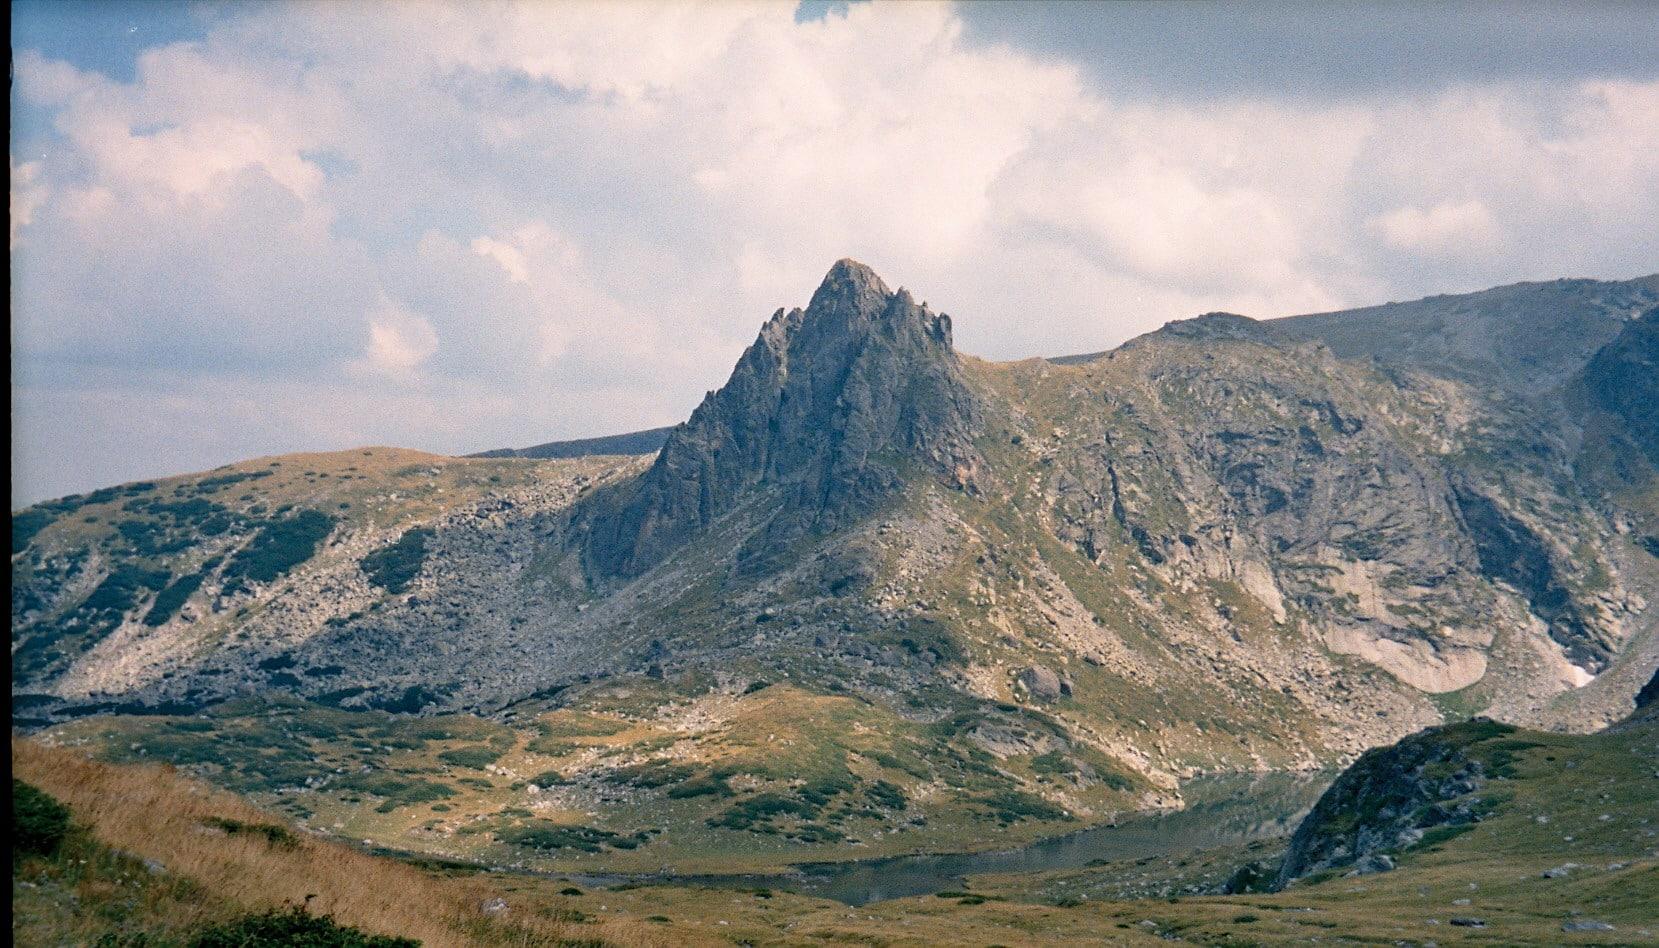 Hiking in Maliovitsa peak, Rila mountains